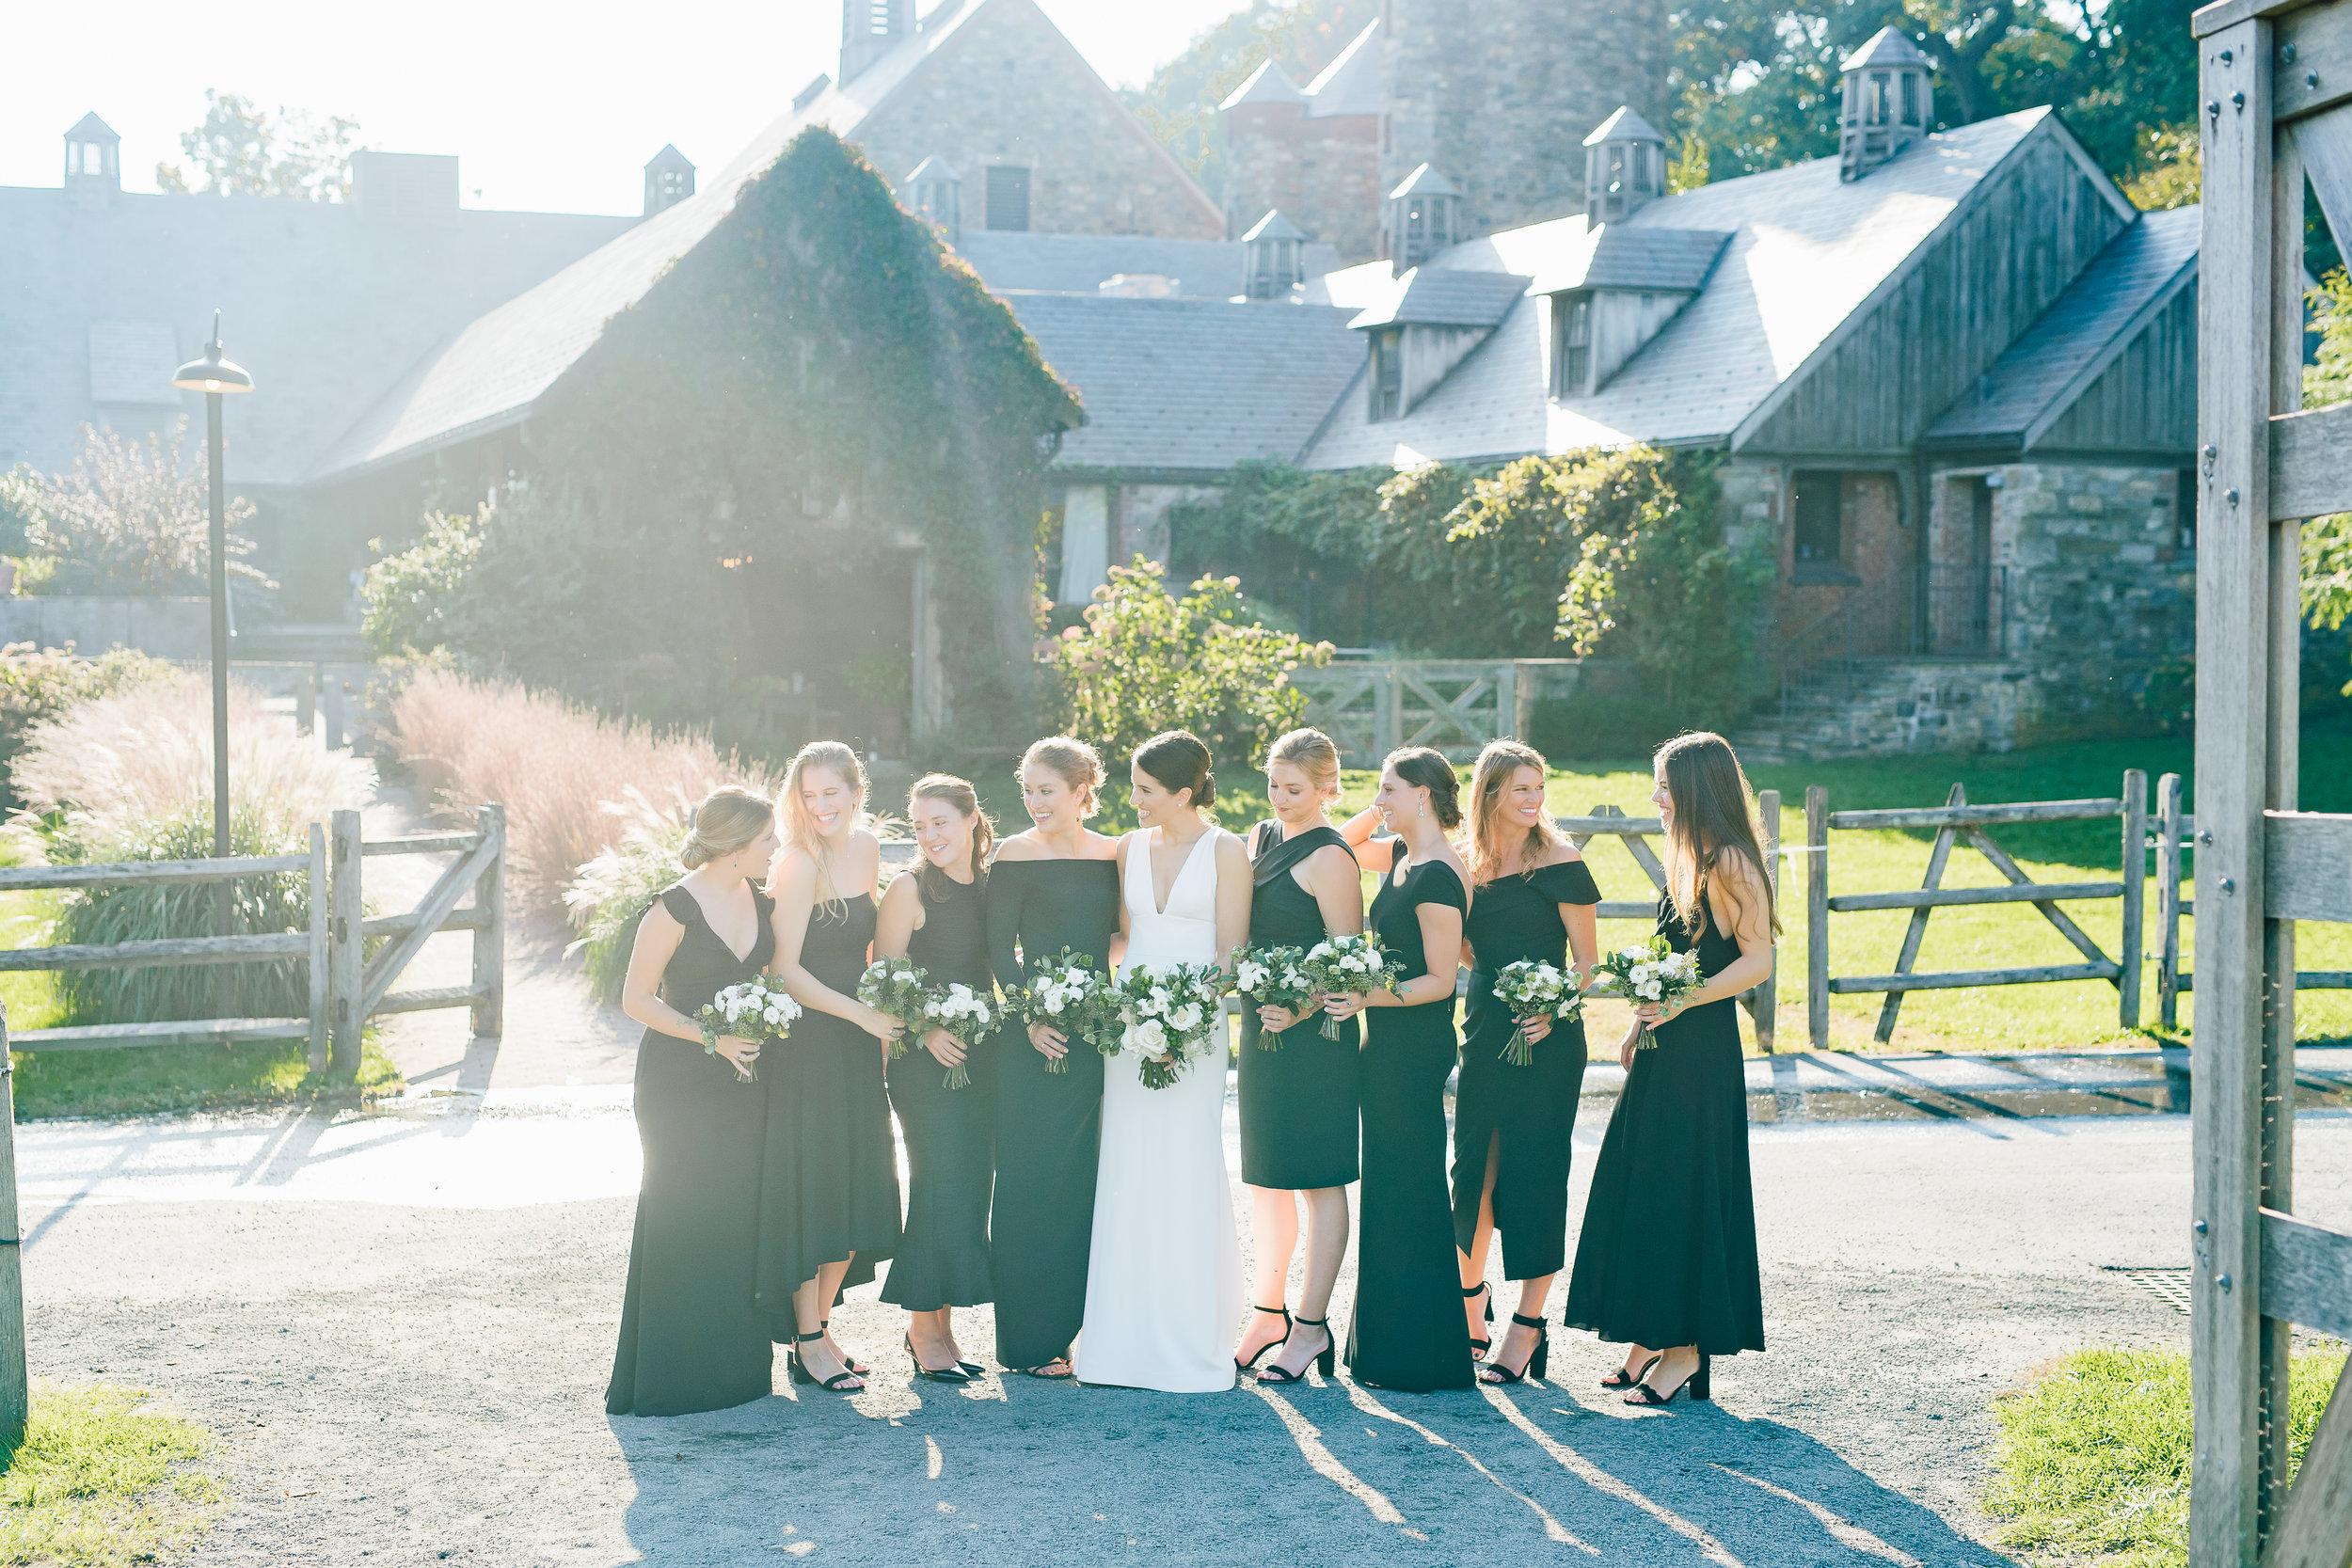 first look wedding photos CT_westport wedding first look_blue hills wedding photos NY